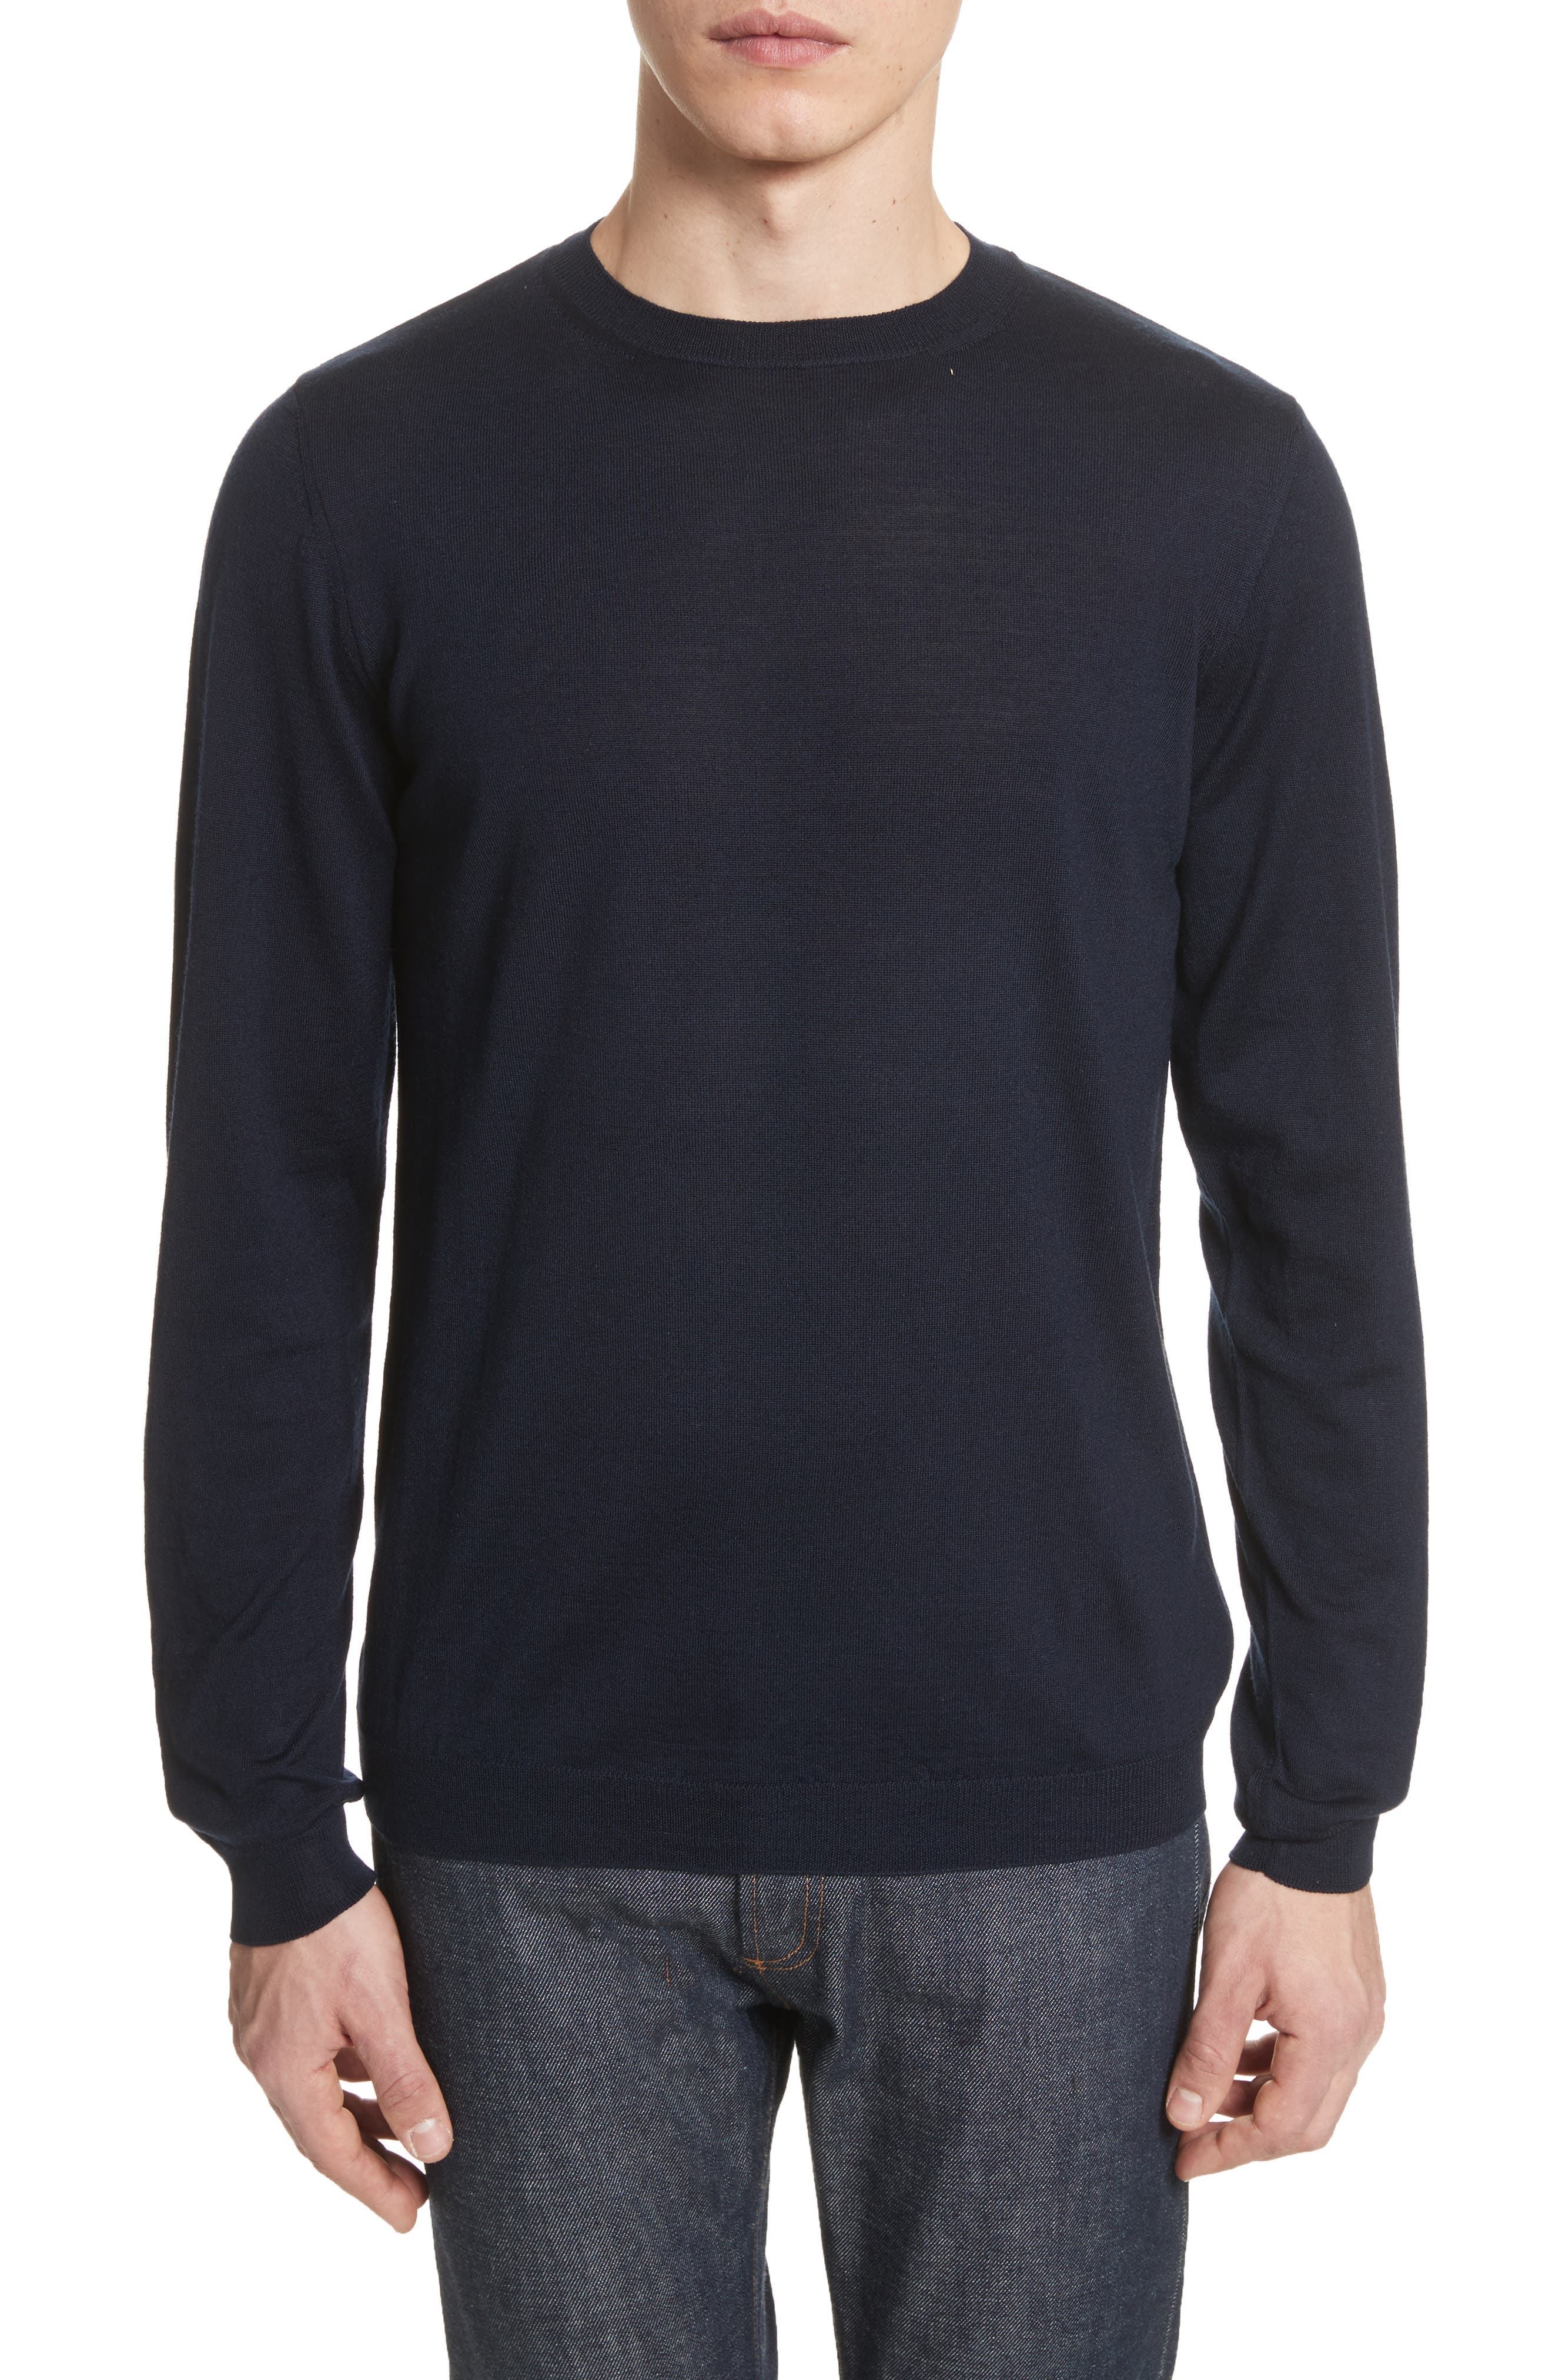 Sigfred Merino Wool & Silk Crewneck Sweater,                             Main thumbnail 1, color,                             412